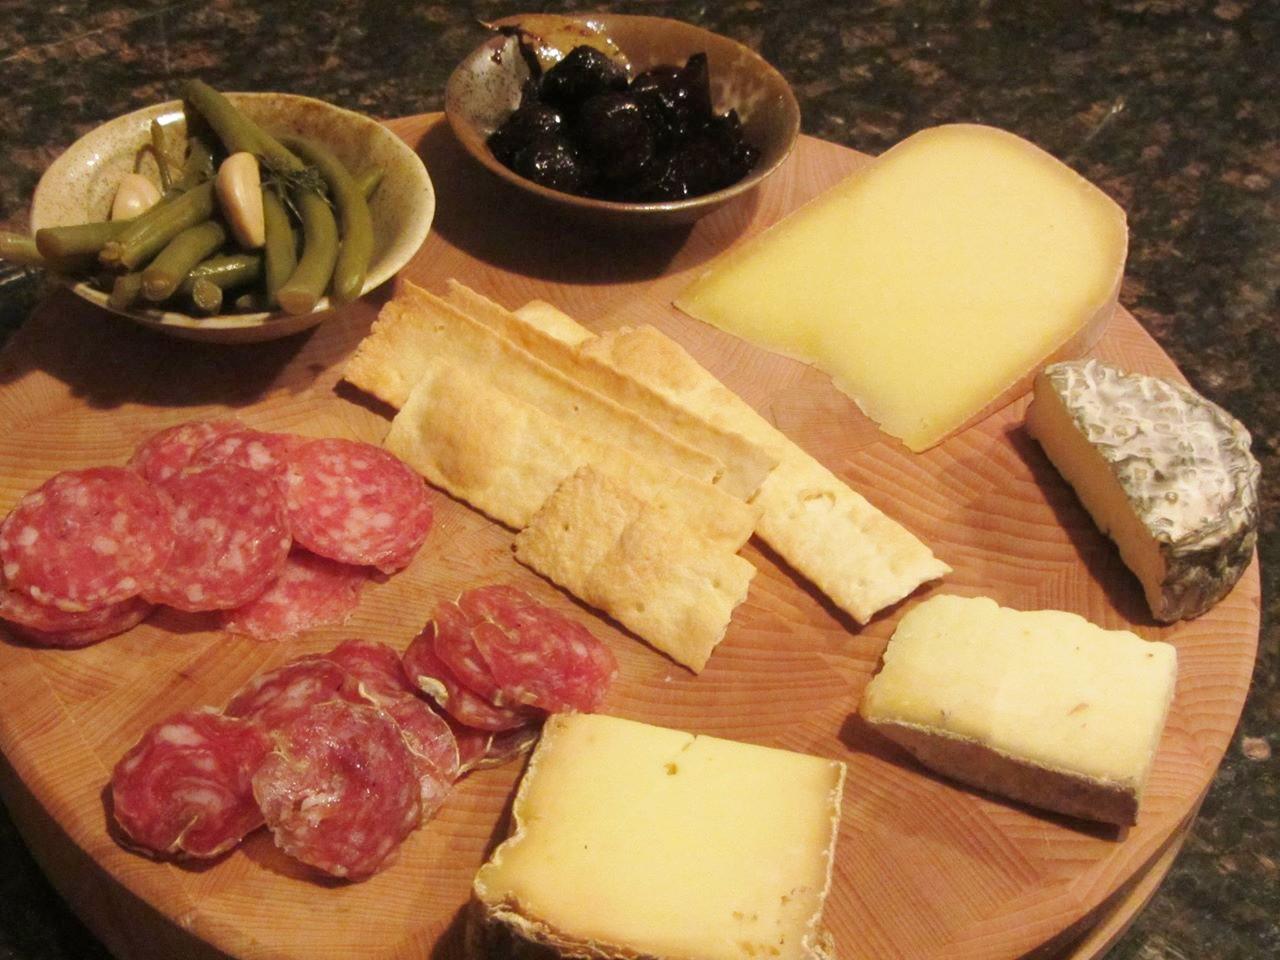 Tartufo salami, sopressata, Mean Beans and red wine figs, Uplands Pleasant Ridge Reserve, Fiore di Capra chevre, Landaff tomme, and Vacherin Fribourgeois